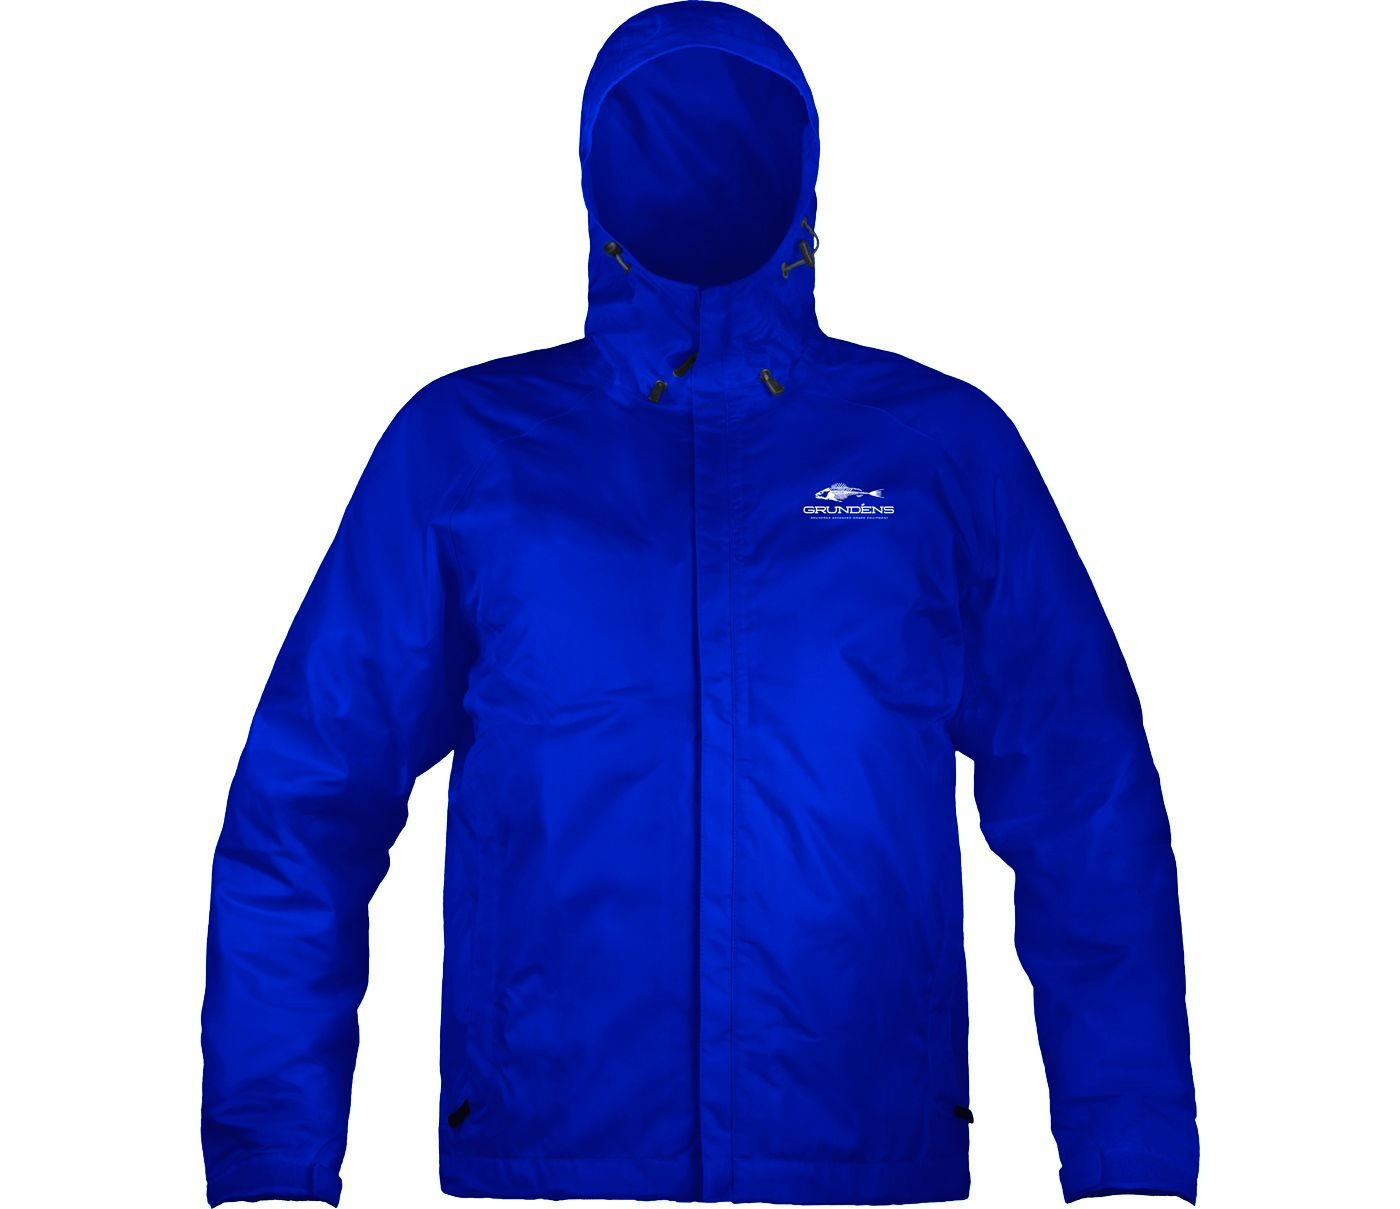 Grundéns Men's Weather Watch Full Zip Jacket